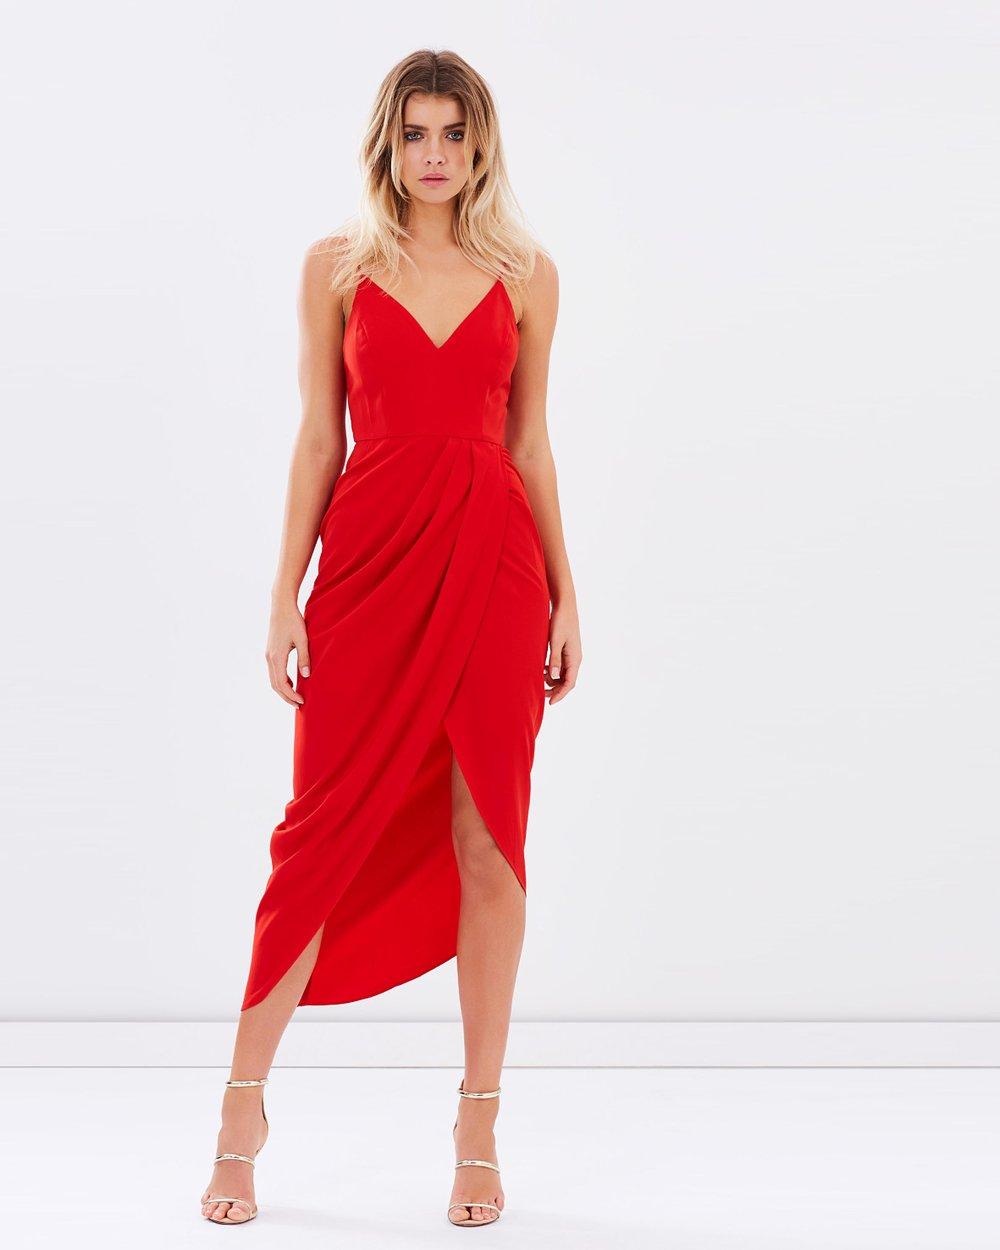 61e61ed41a0dd Core Cocktail Dress by Shona Joy Online